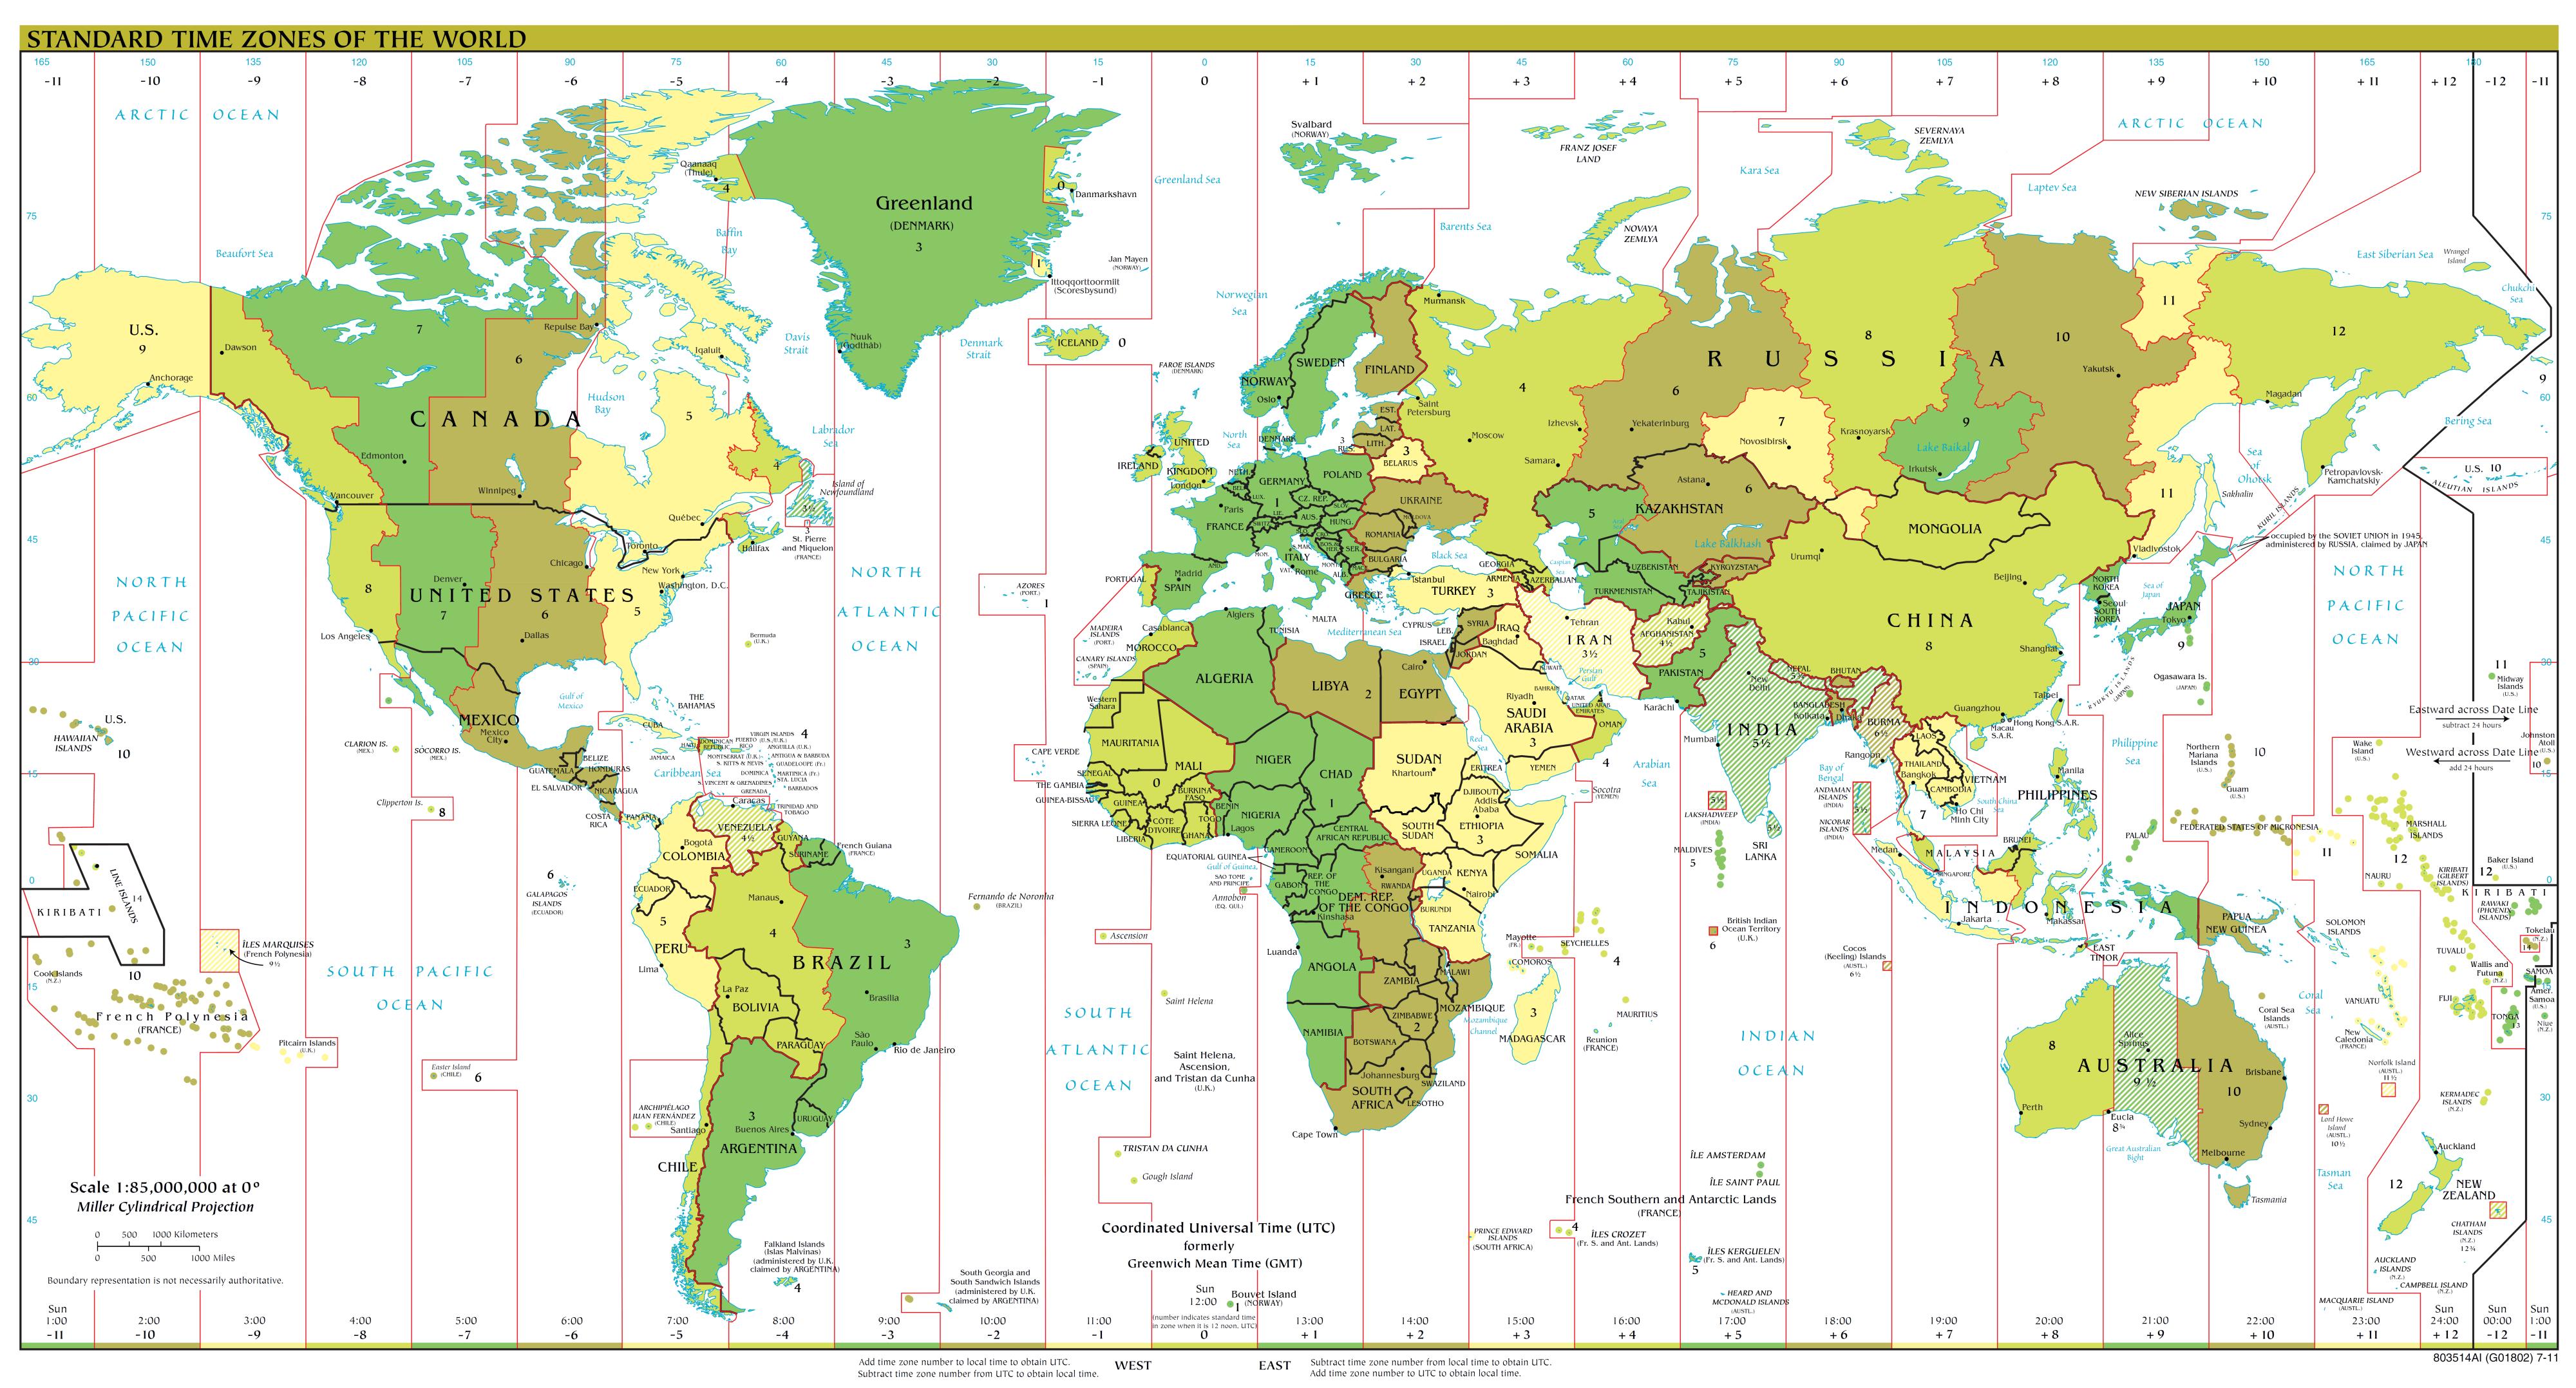 Global Time Zones - via Wikipedia